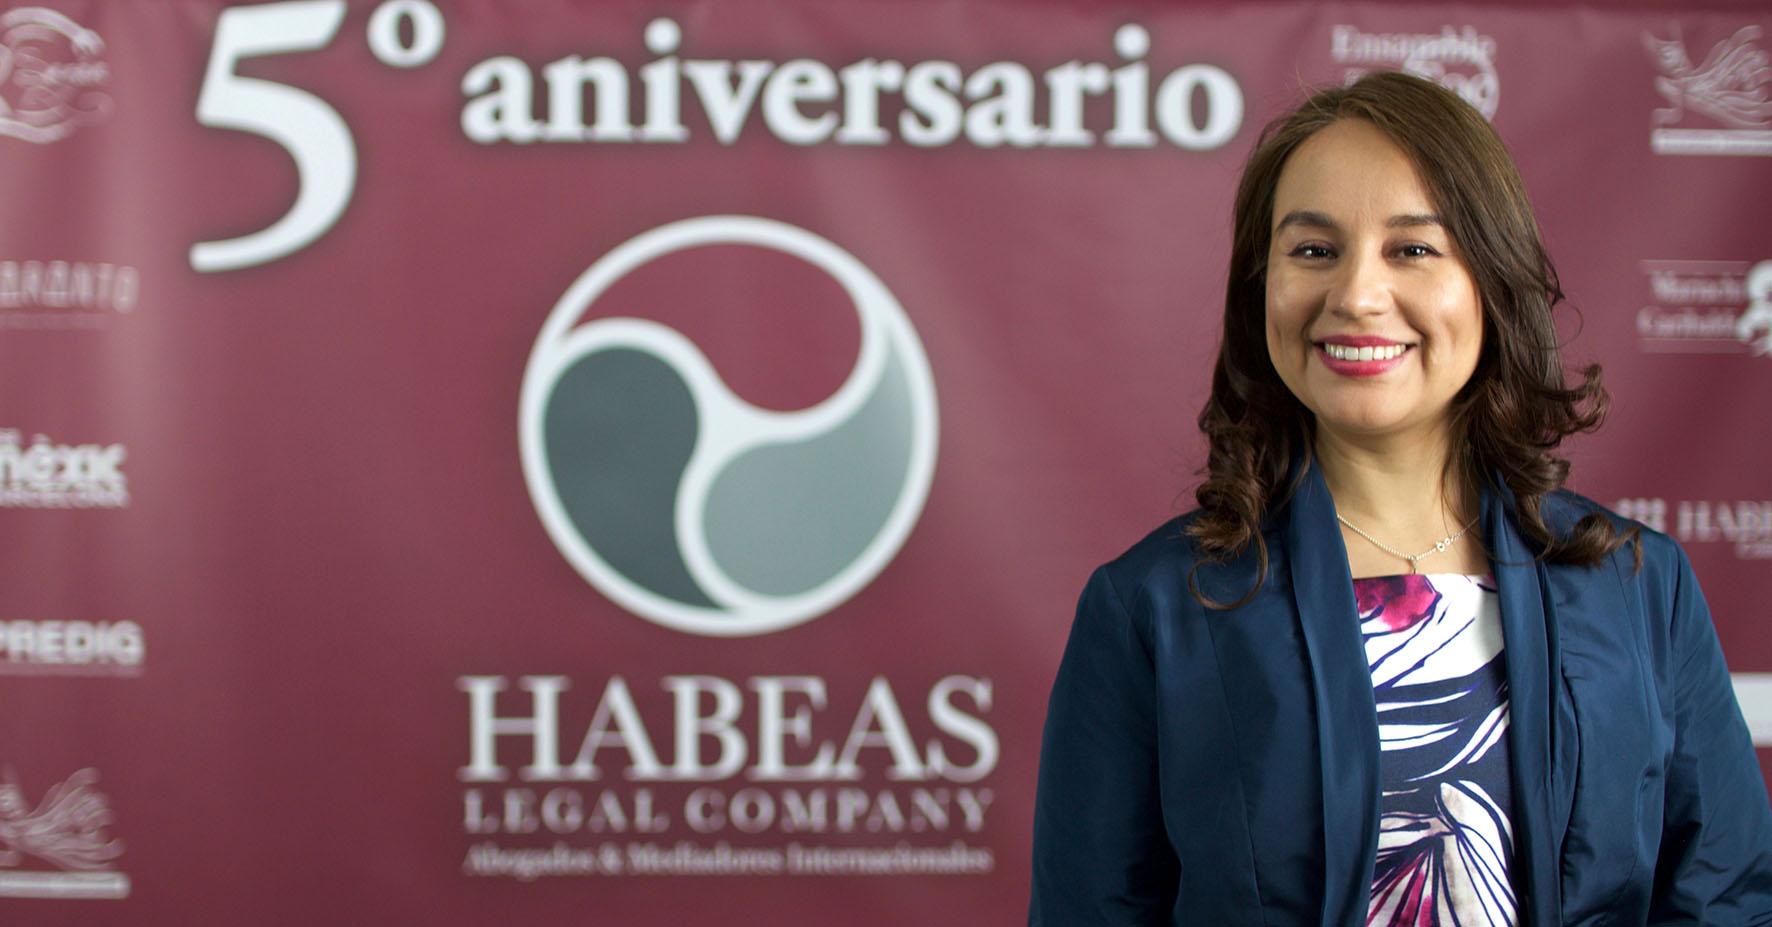 Habeas Legal 5º aniversario blog - Blog